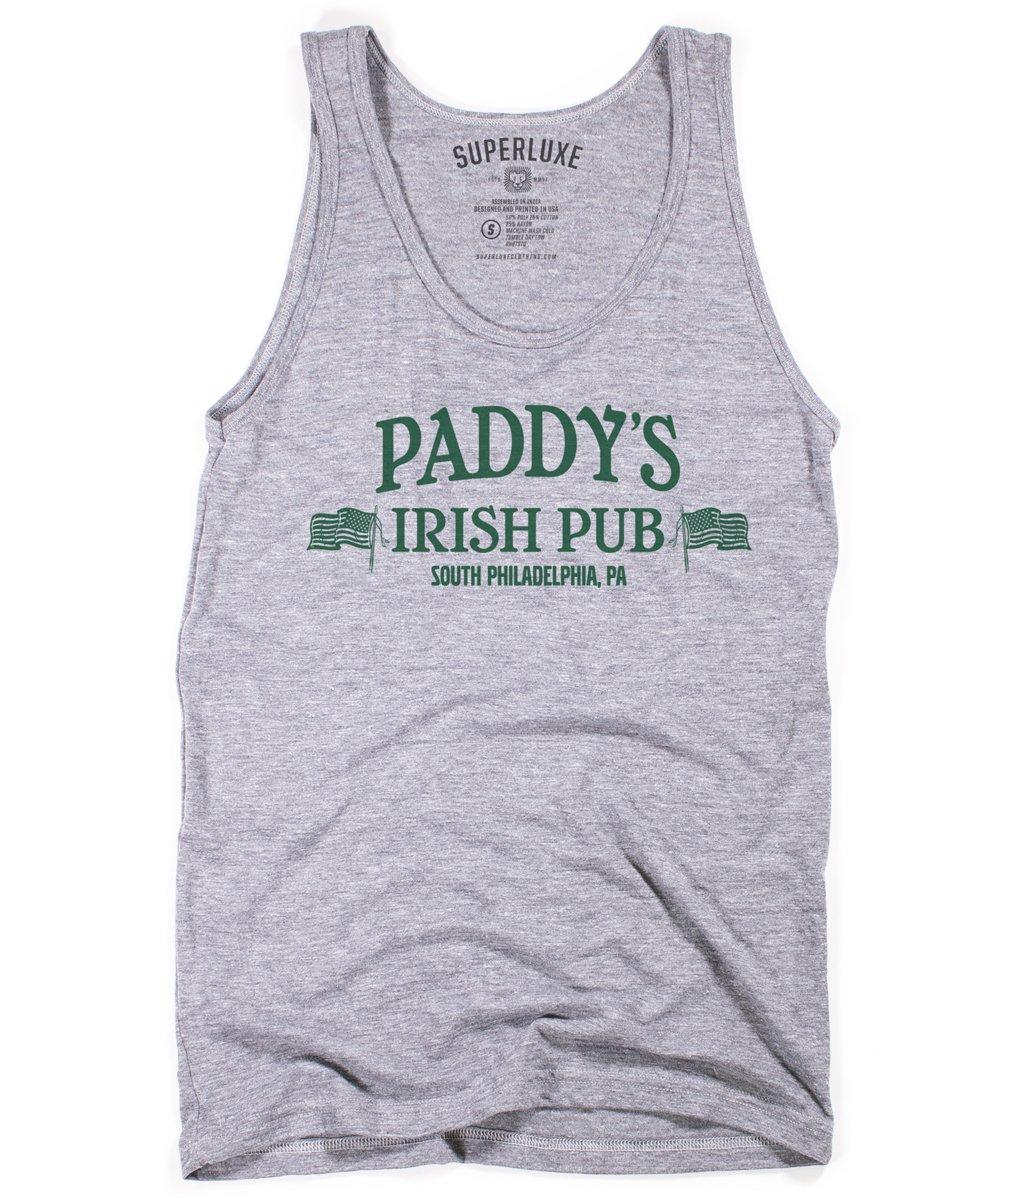 Clothing S Paddys Irish Pub St Patricks Day Bar Tank Top 5074 Shirts